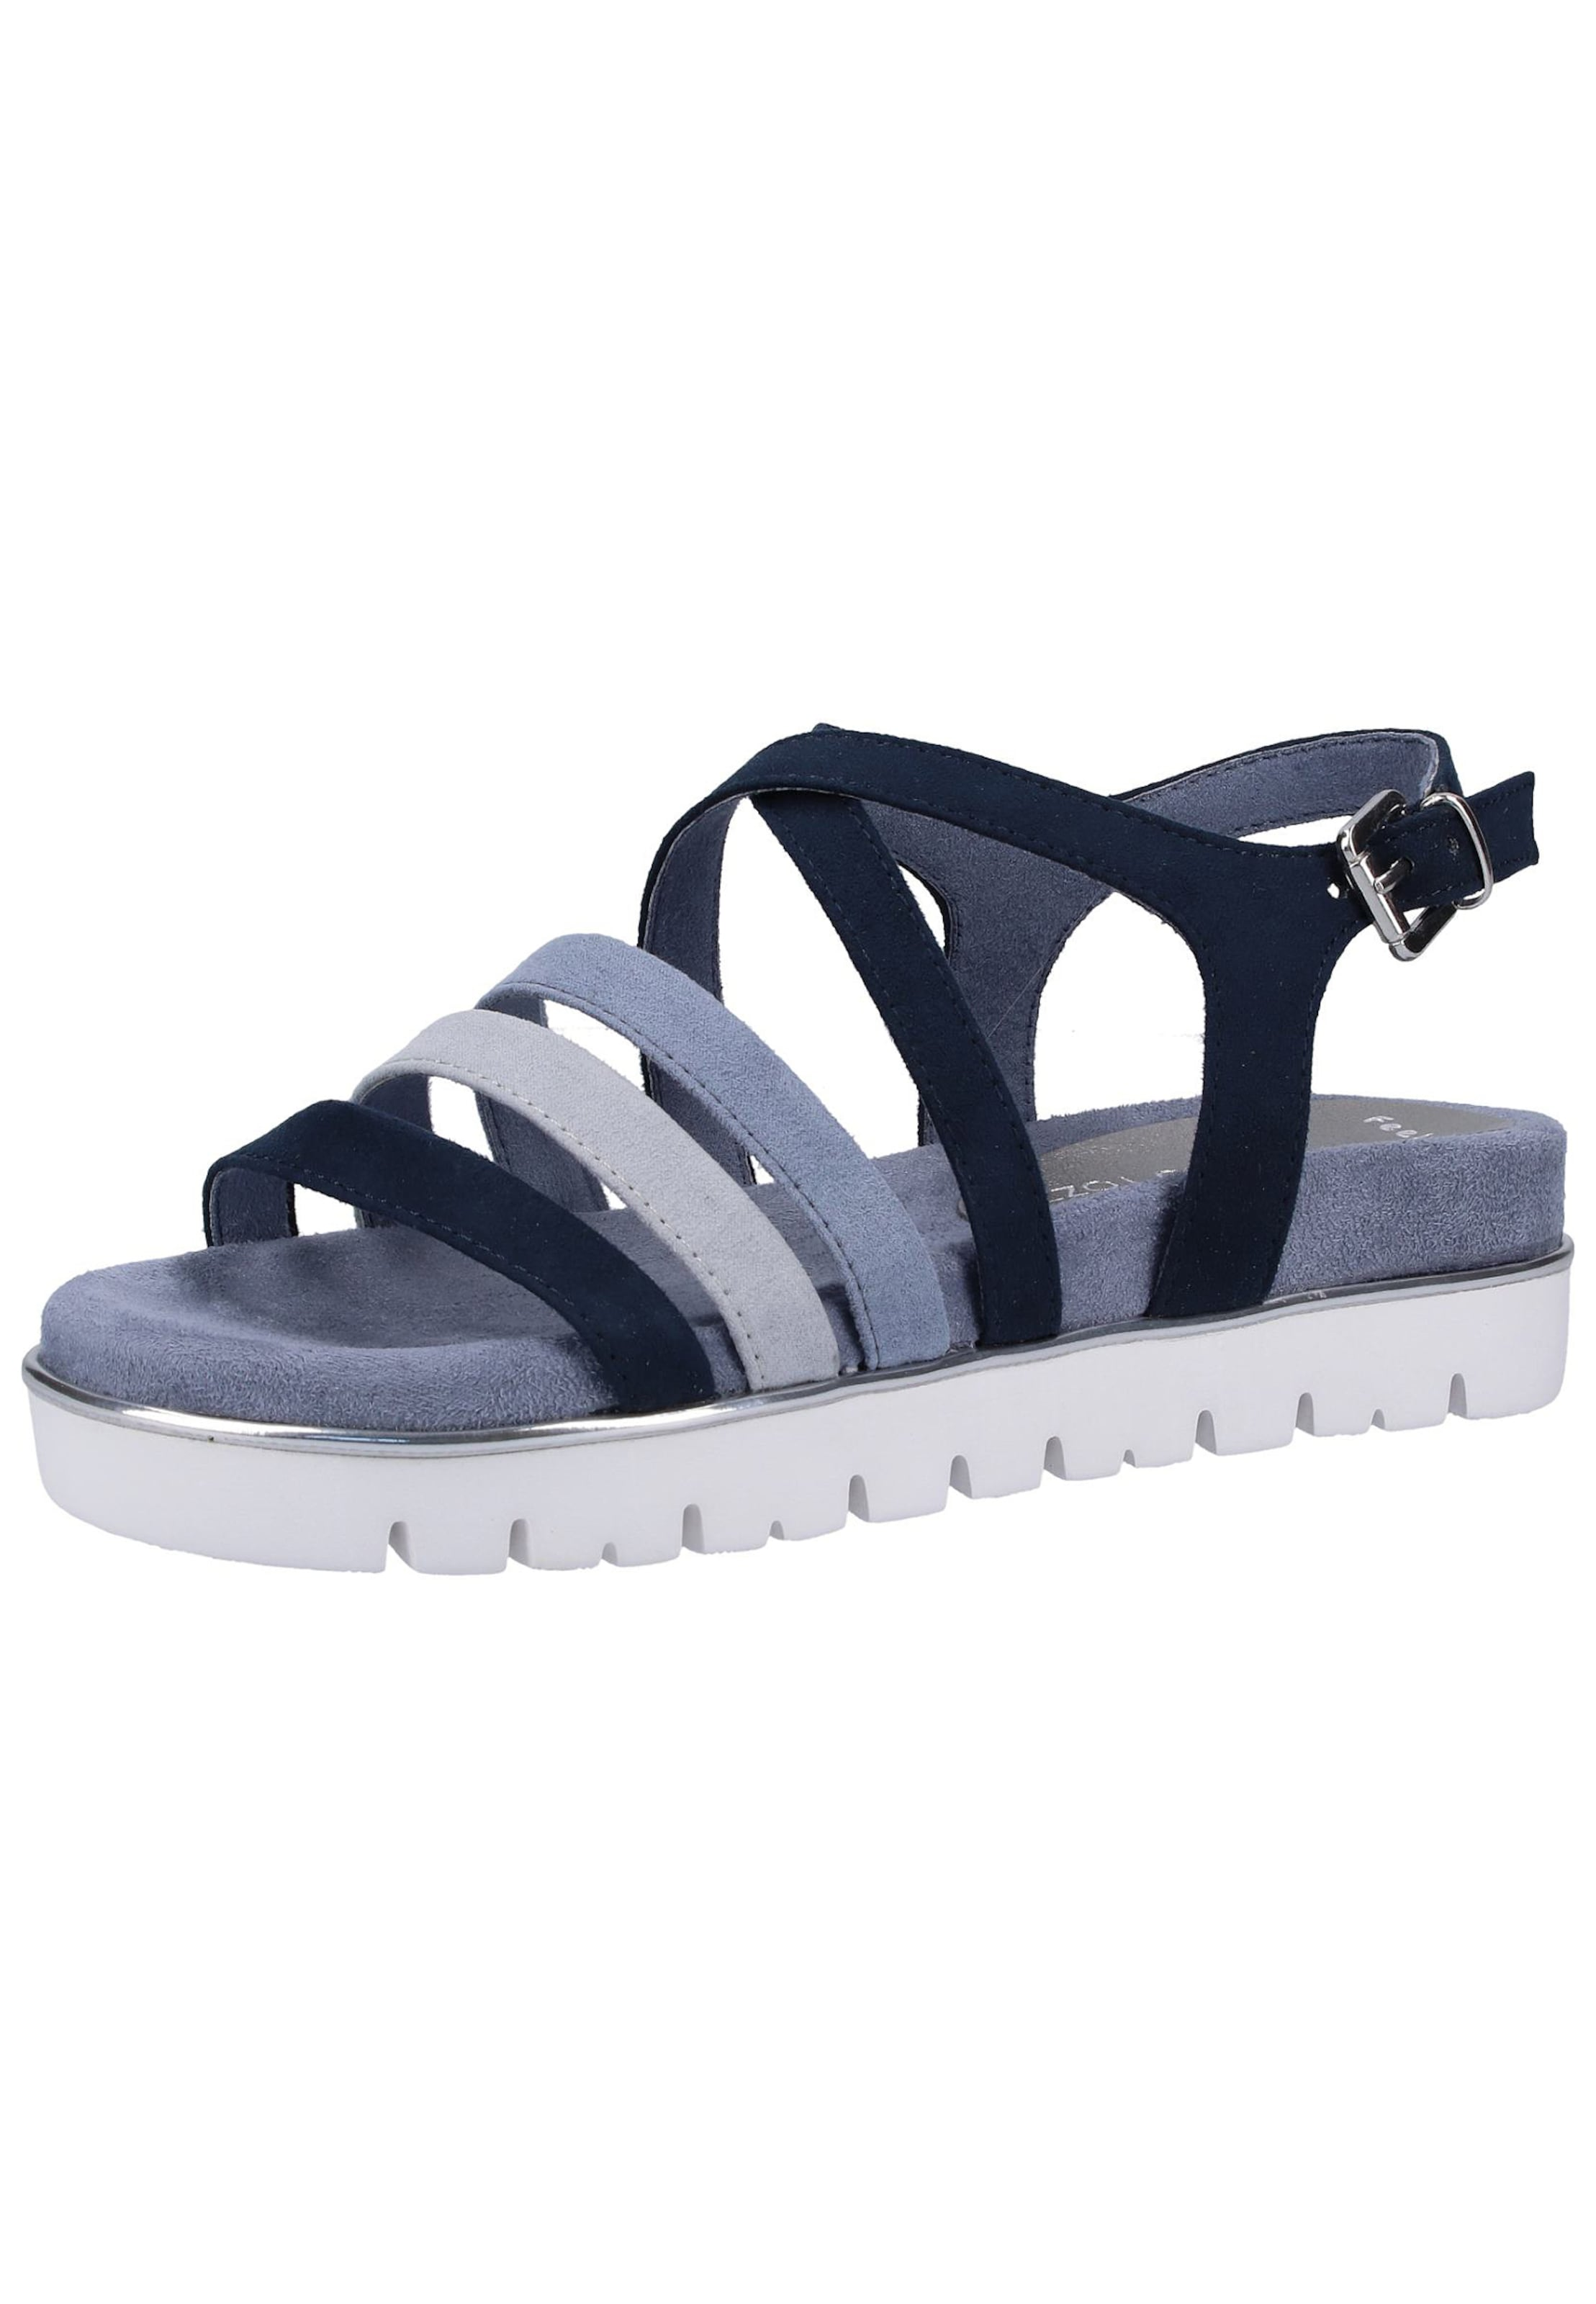 MARCO TOZZI Sandalen in blau   navy   rauchblau